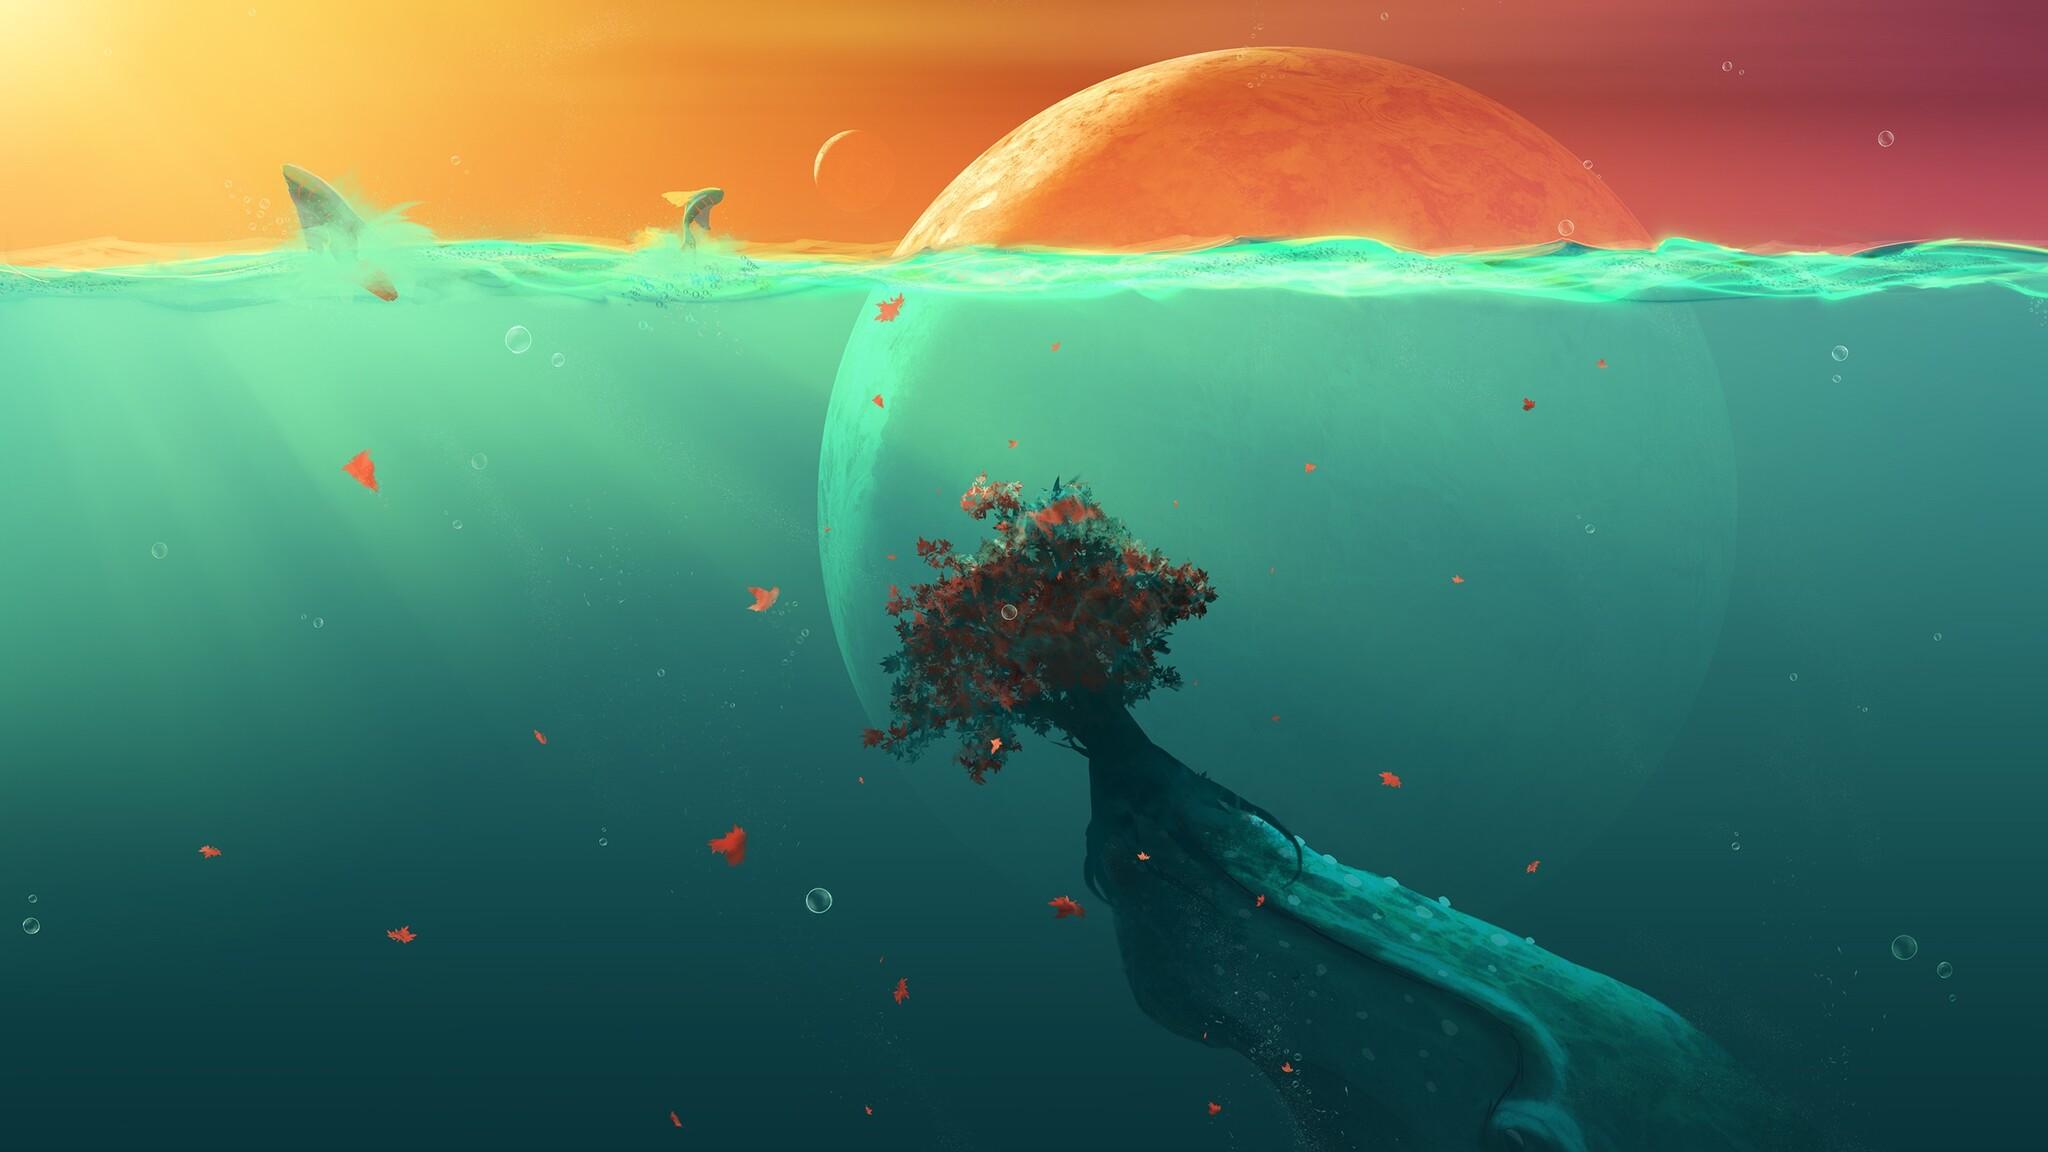 Cute Wallpapers For Girls  2048x1152 Deep Ocean Planet Fish 2048x1152 Resolution Hd